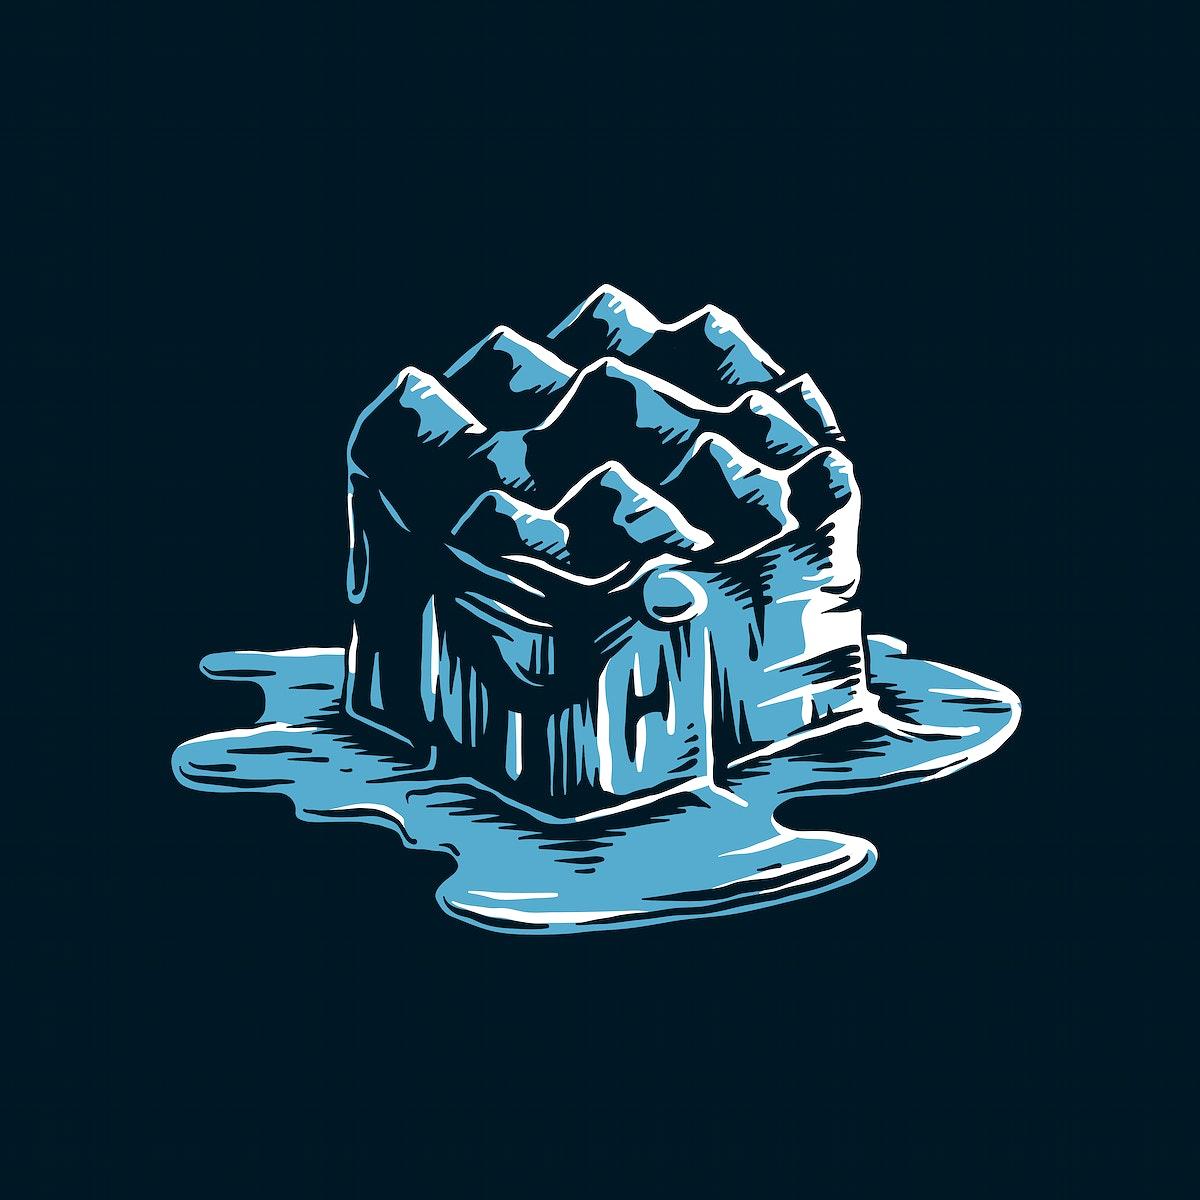 Melting iceberg from global warming effect illustration